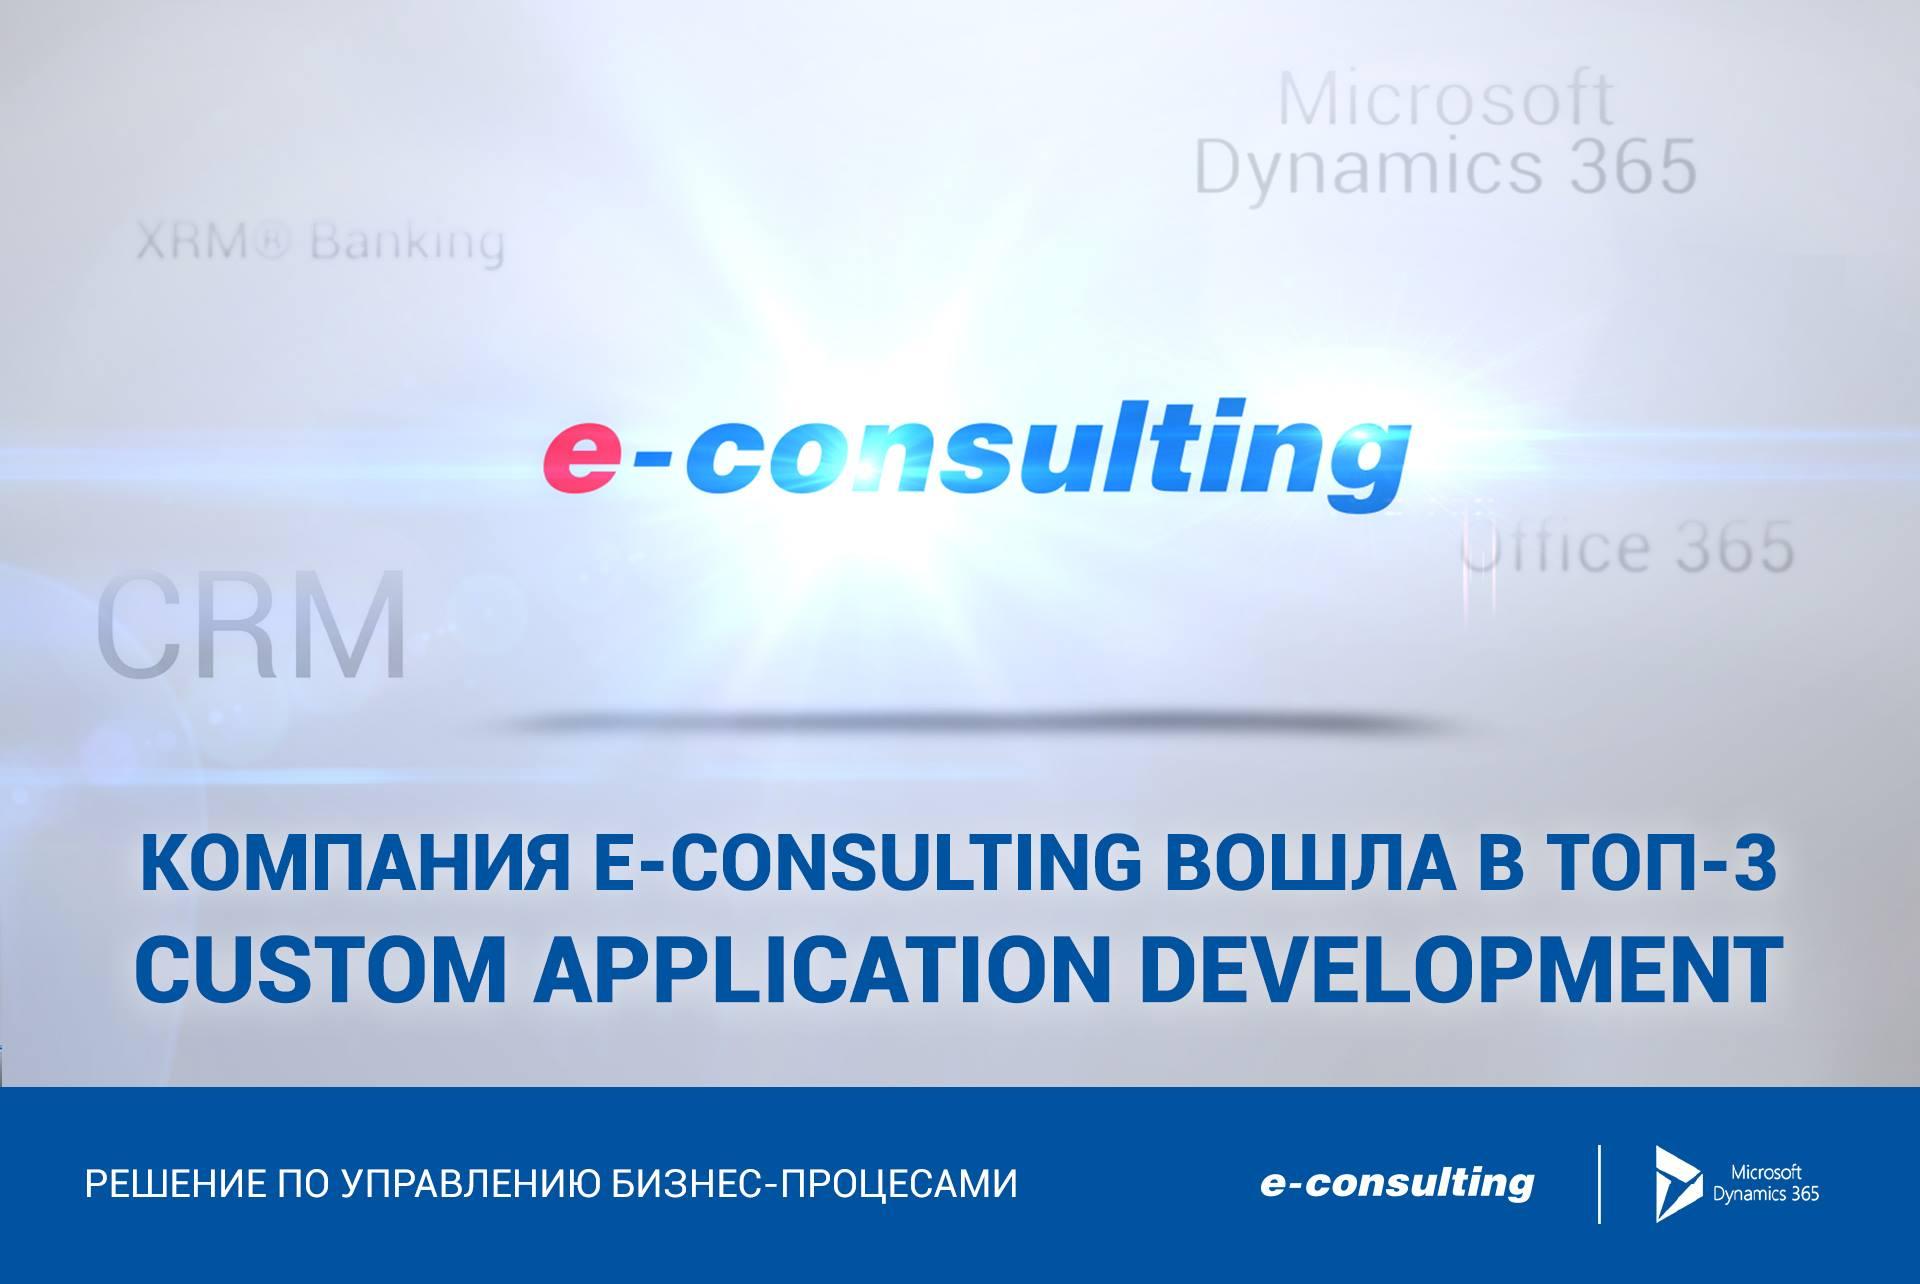 Компания E-consulting вошла в топ-3 Custom Application Development